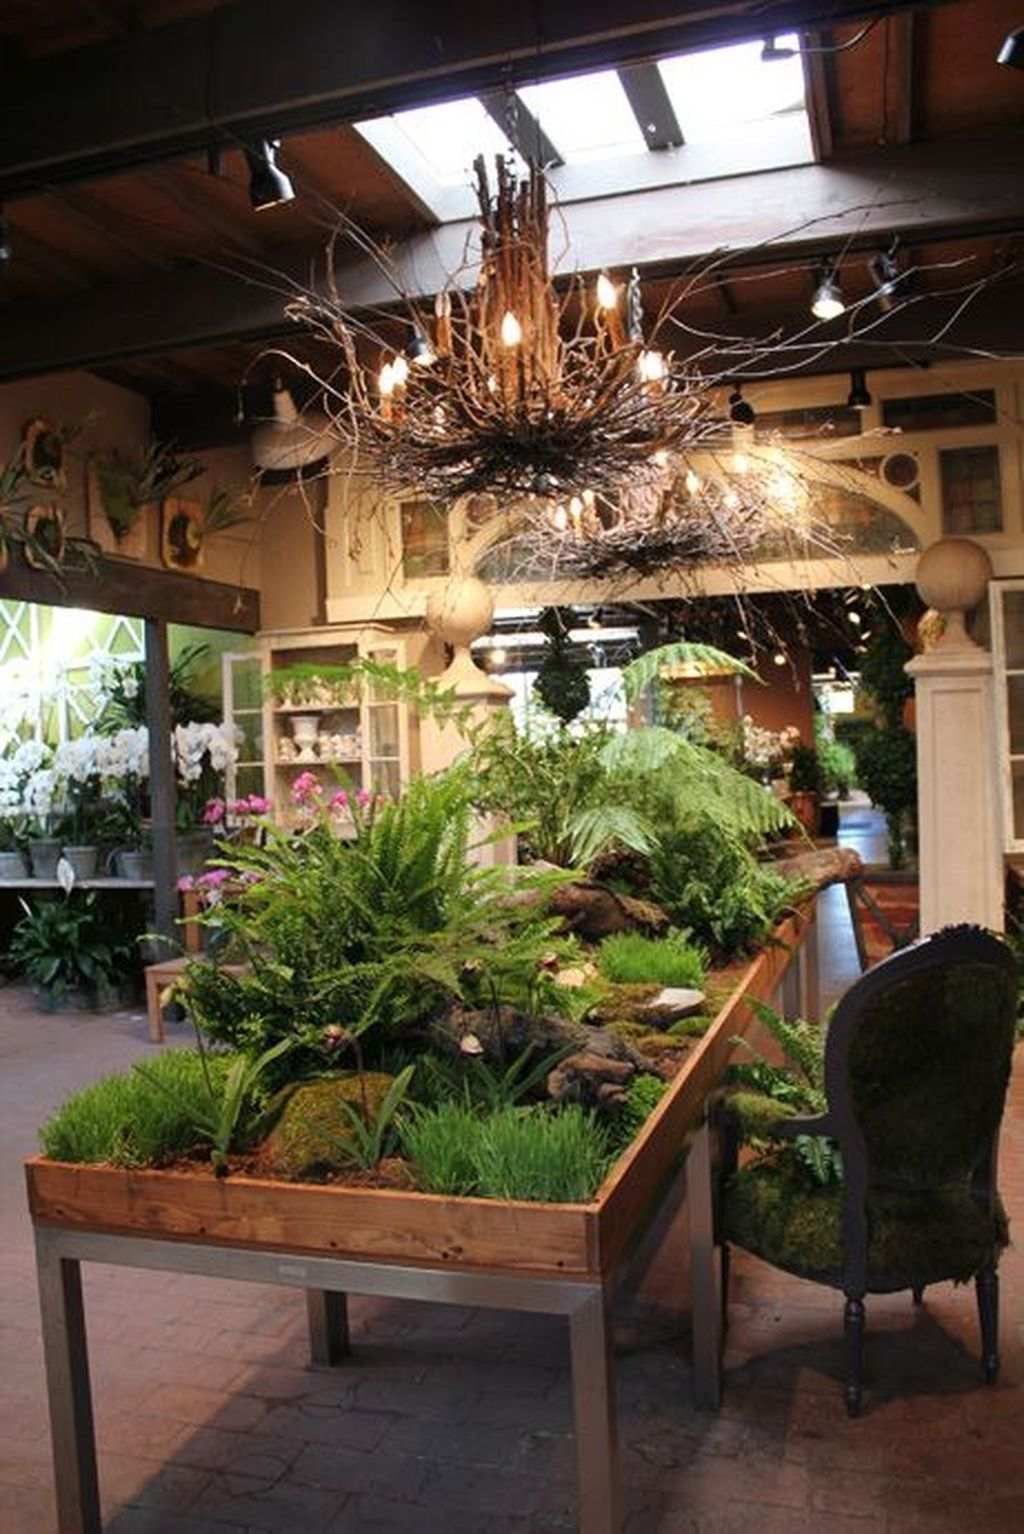 39 Relaxing Garden Design Studio Ideas (With images